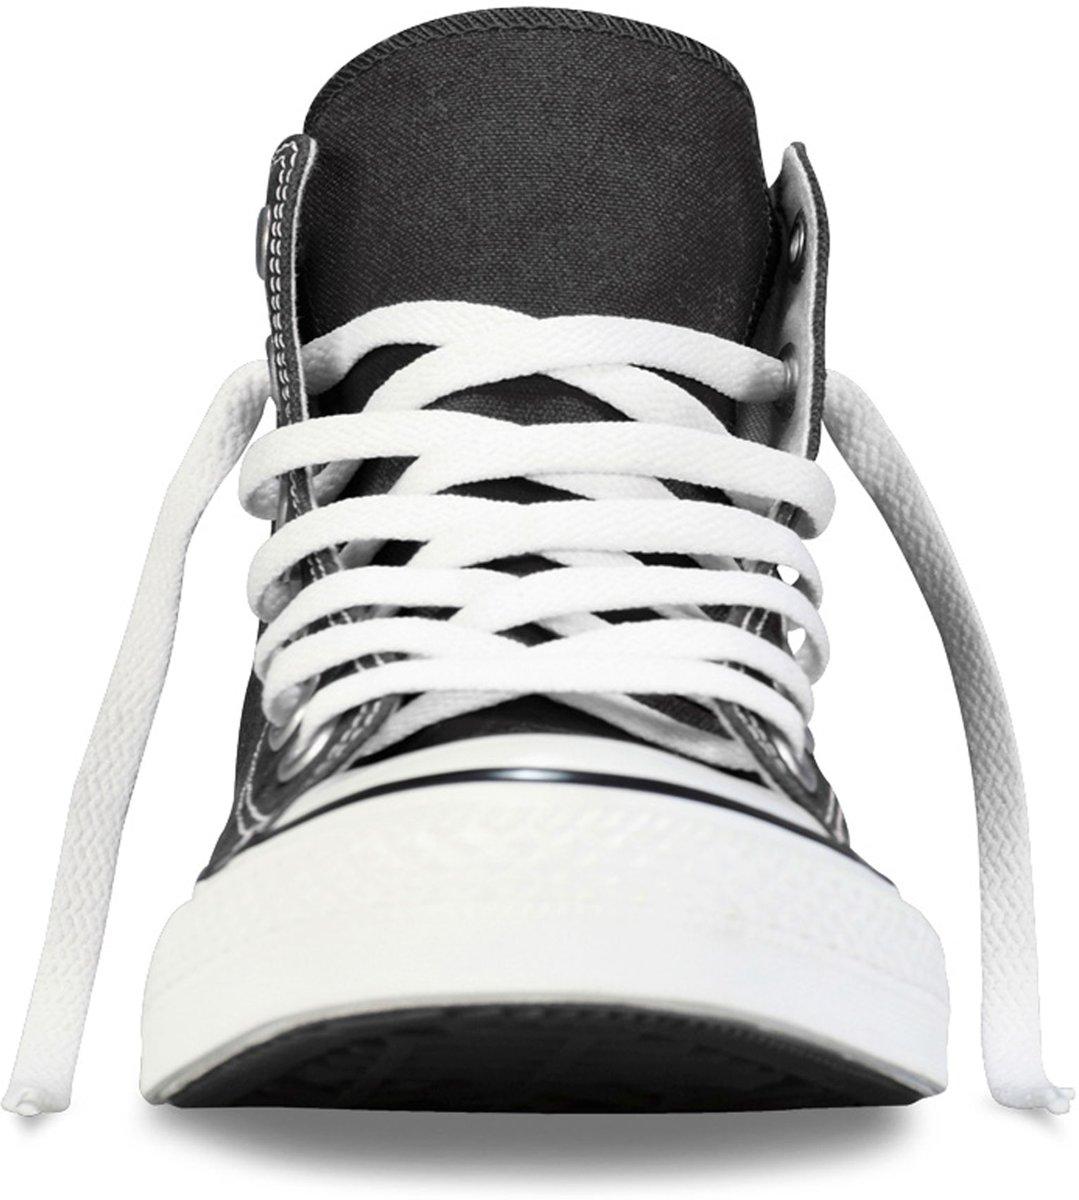 0db3a71506e bol.com | Converse Chuck Taylor All Star Hi Sneakers - Maat 26 - Unisex -  zwart/wit